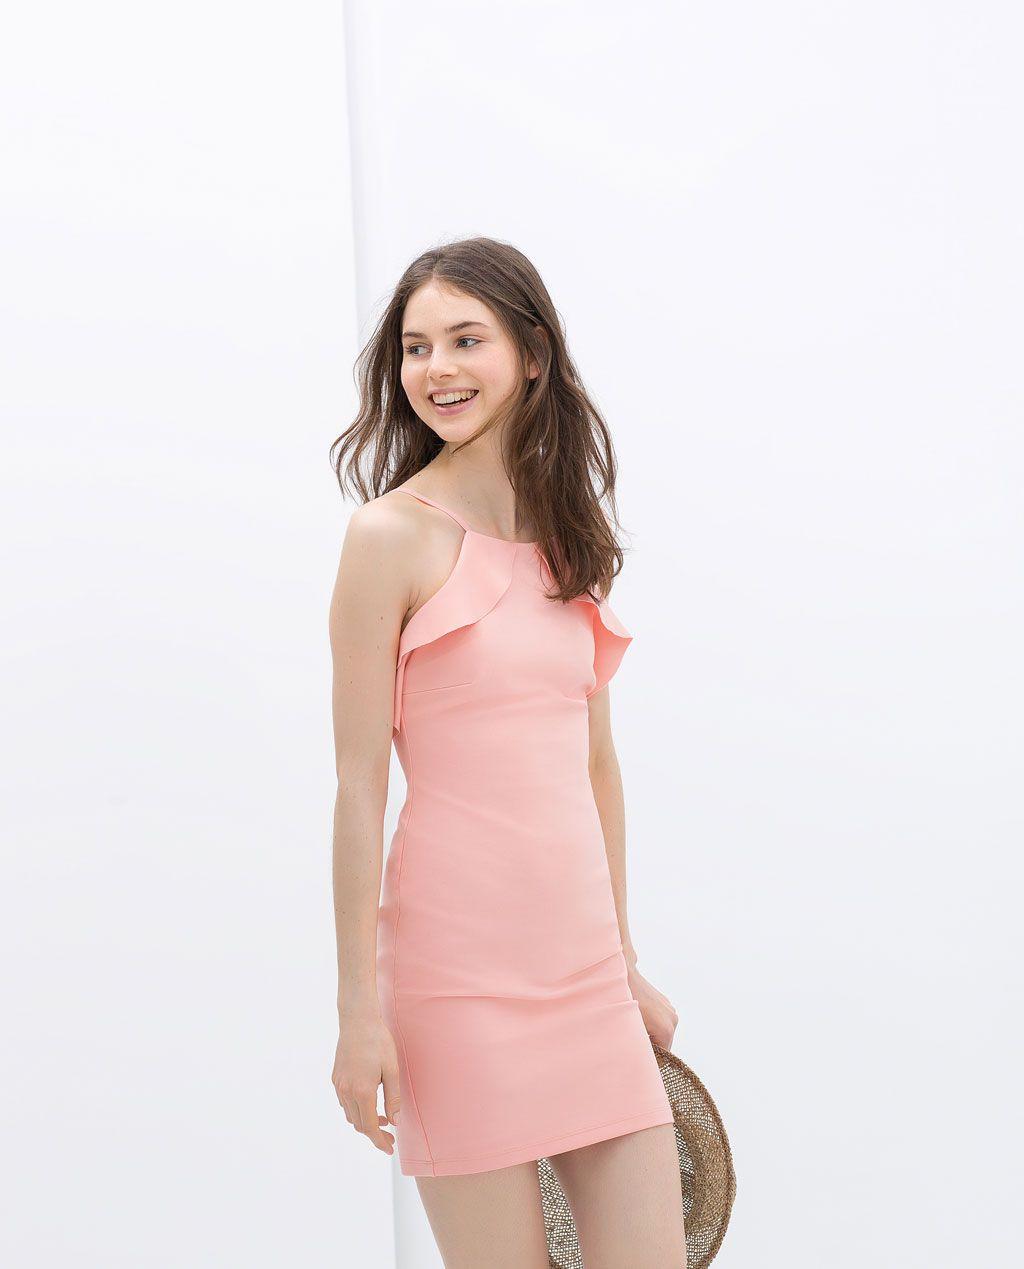 ZARA - ÚLTIMA SEMANA - VESTIDO TUBO | Outfits | Pinterest | Vestido ...